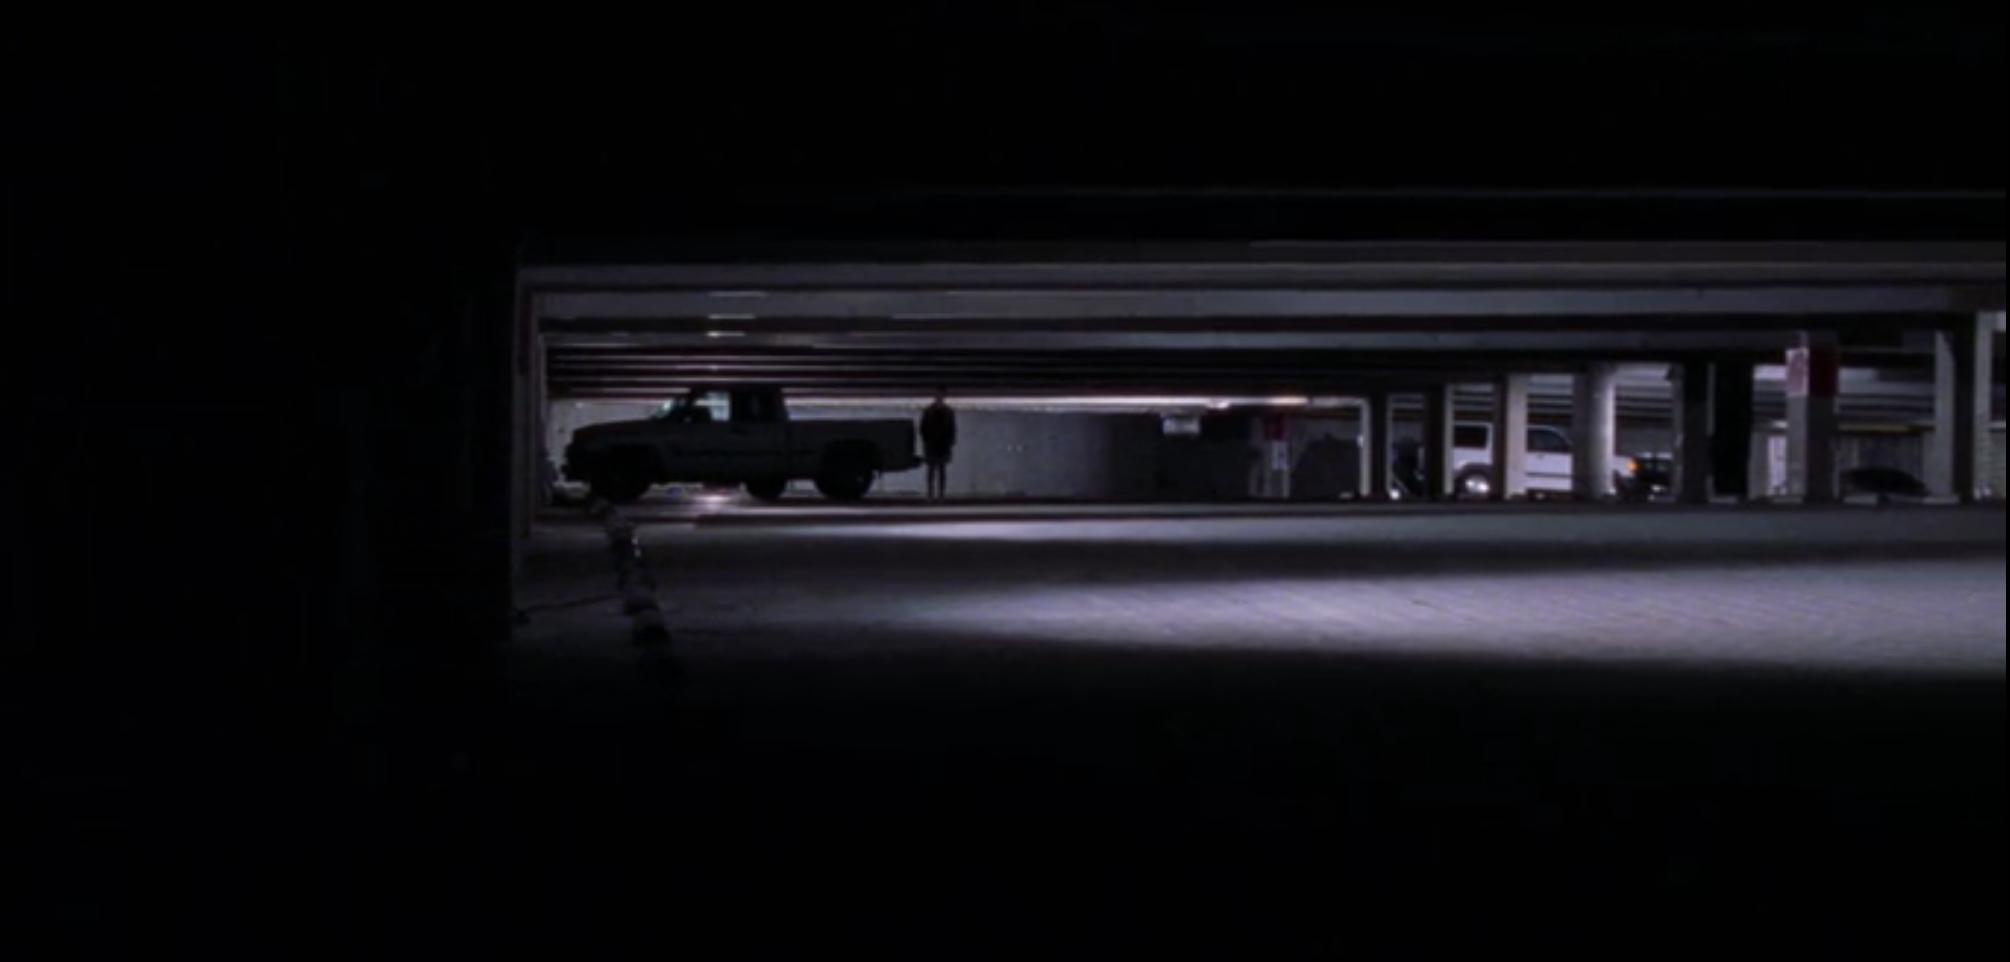 Parking-Garage-I-Solemnly-Swear-Gilmore-Girls